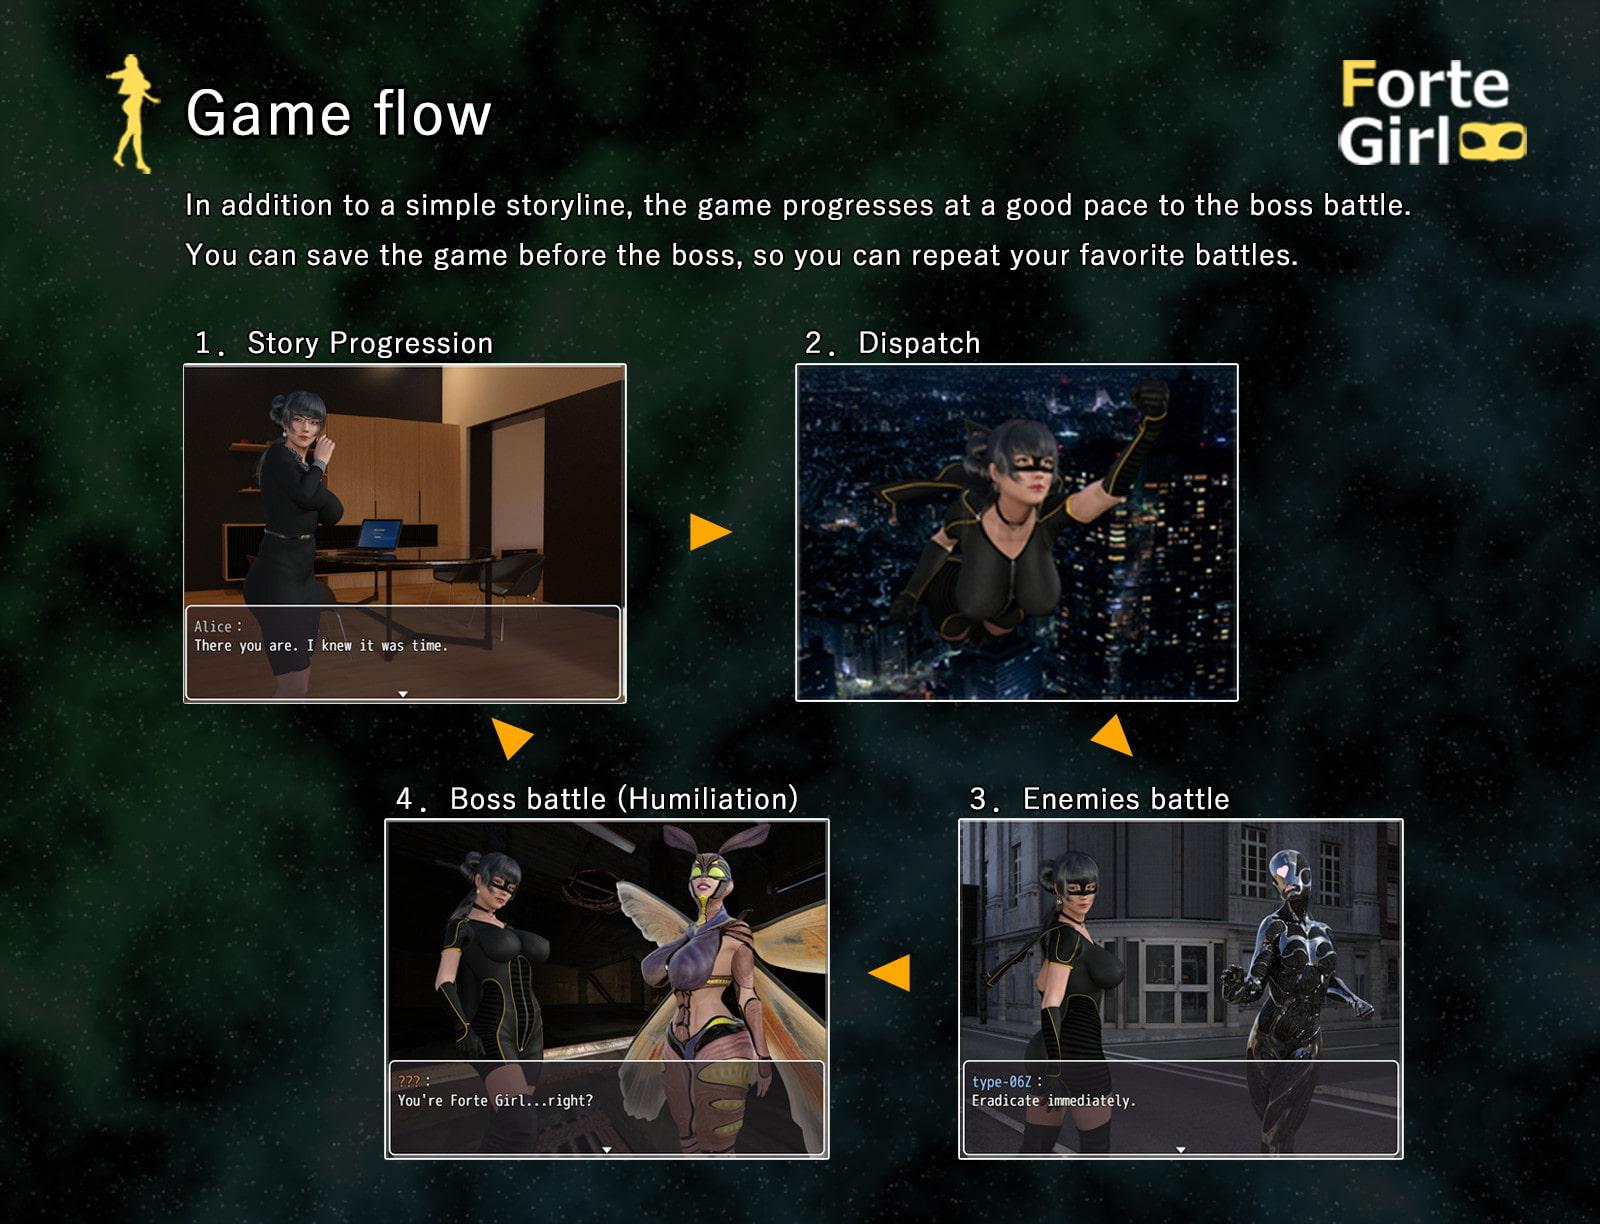 Forte Girl (English version)